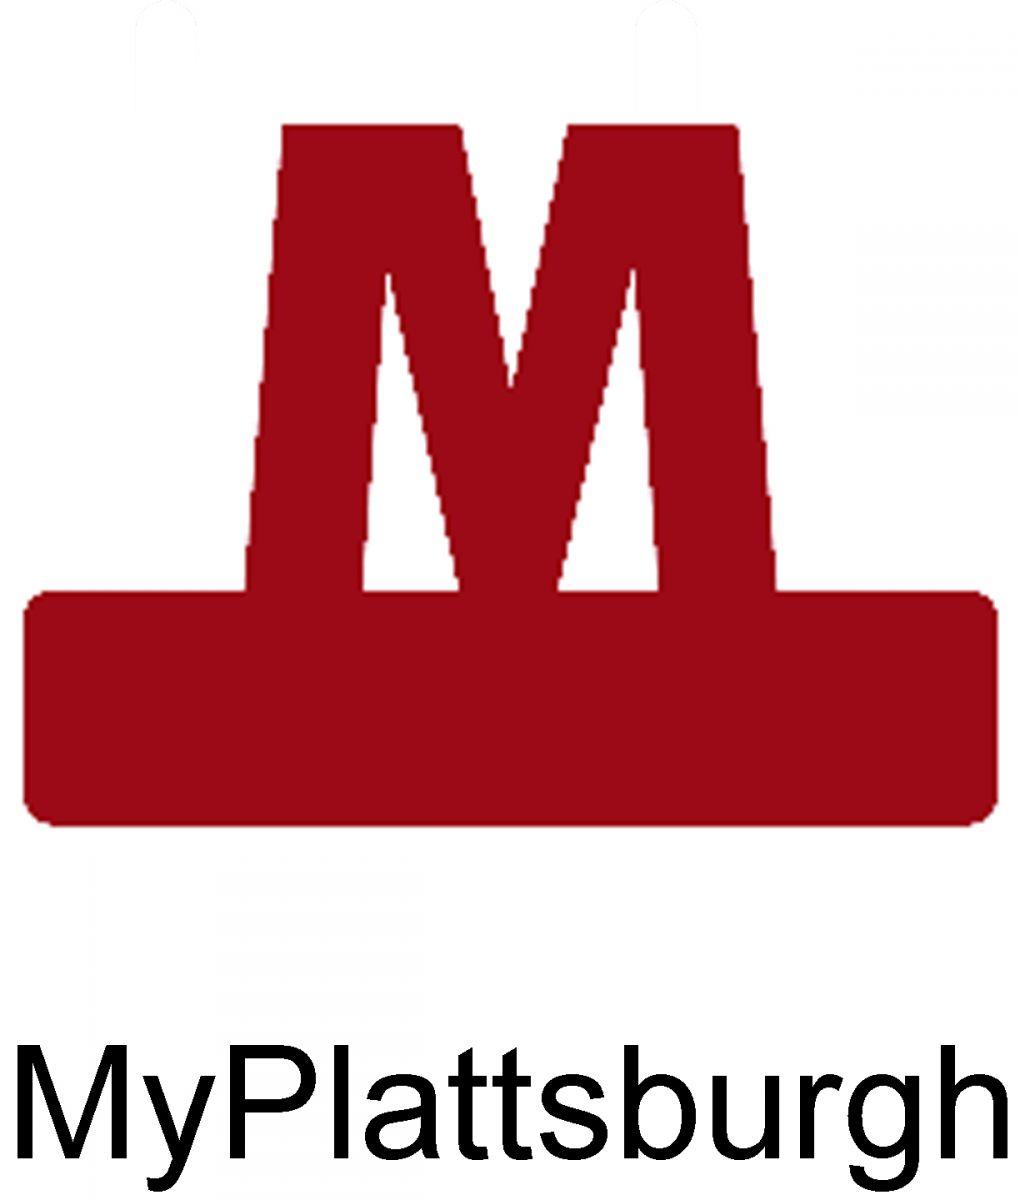 MyPlattsburgh